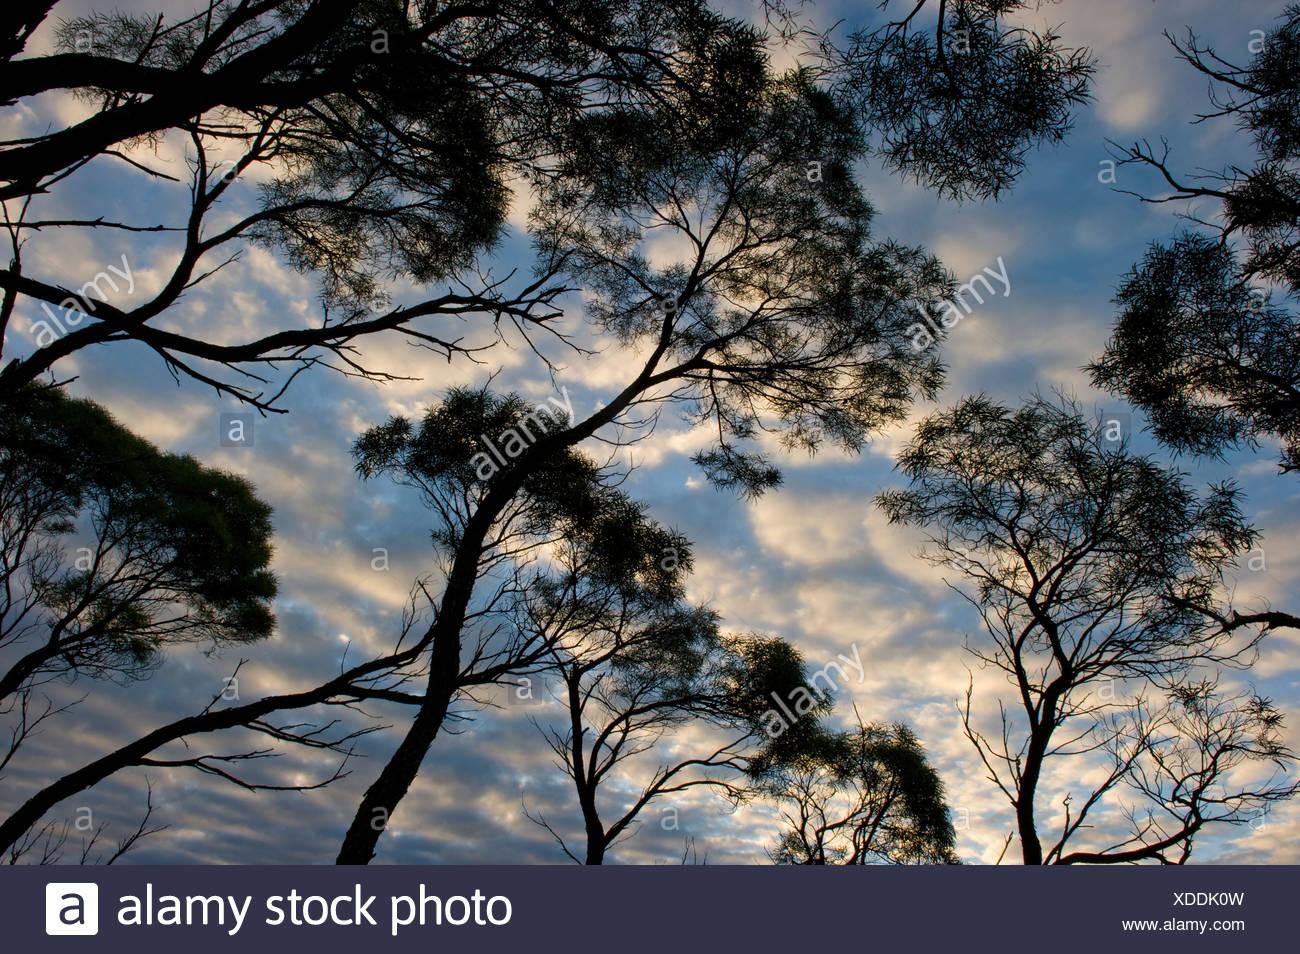 A dramatic morning sky highlight the eucalyptus tree canopy. - Stock Image